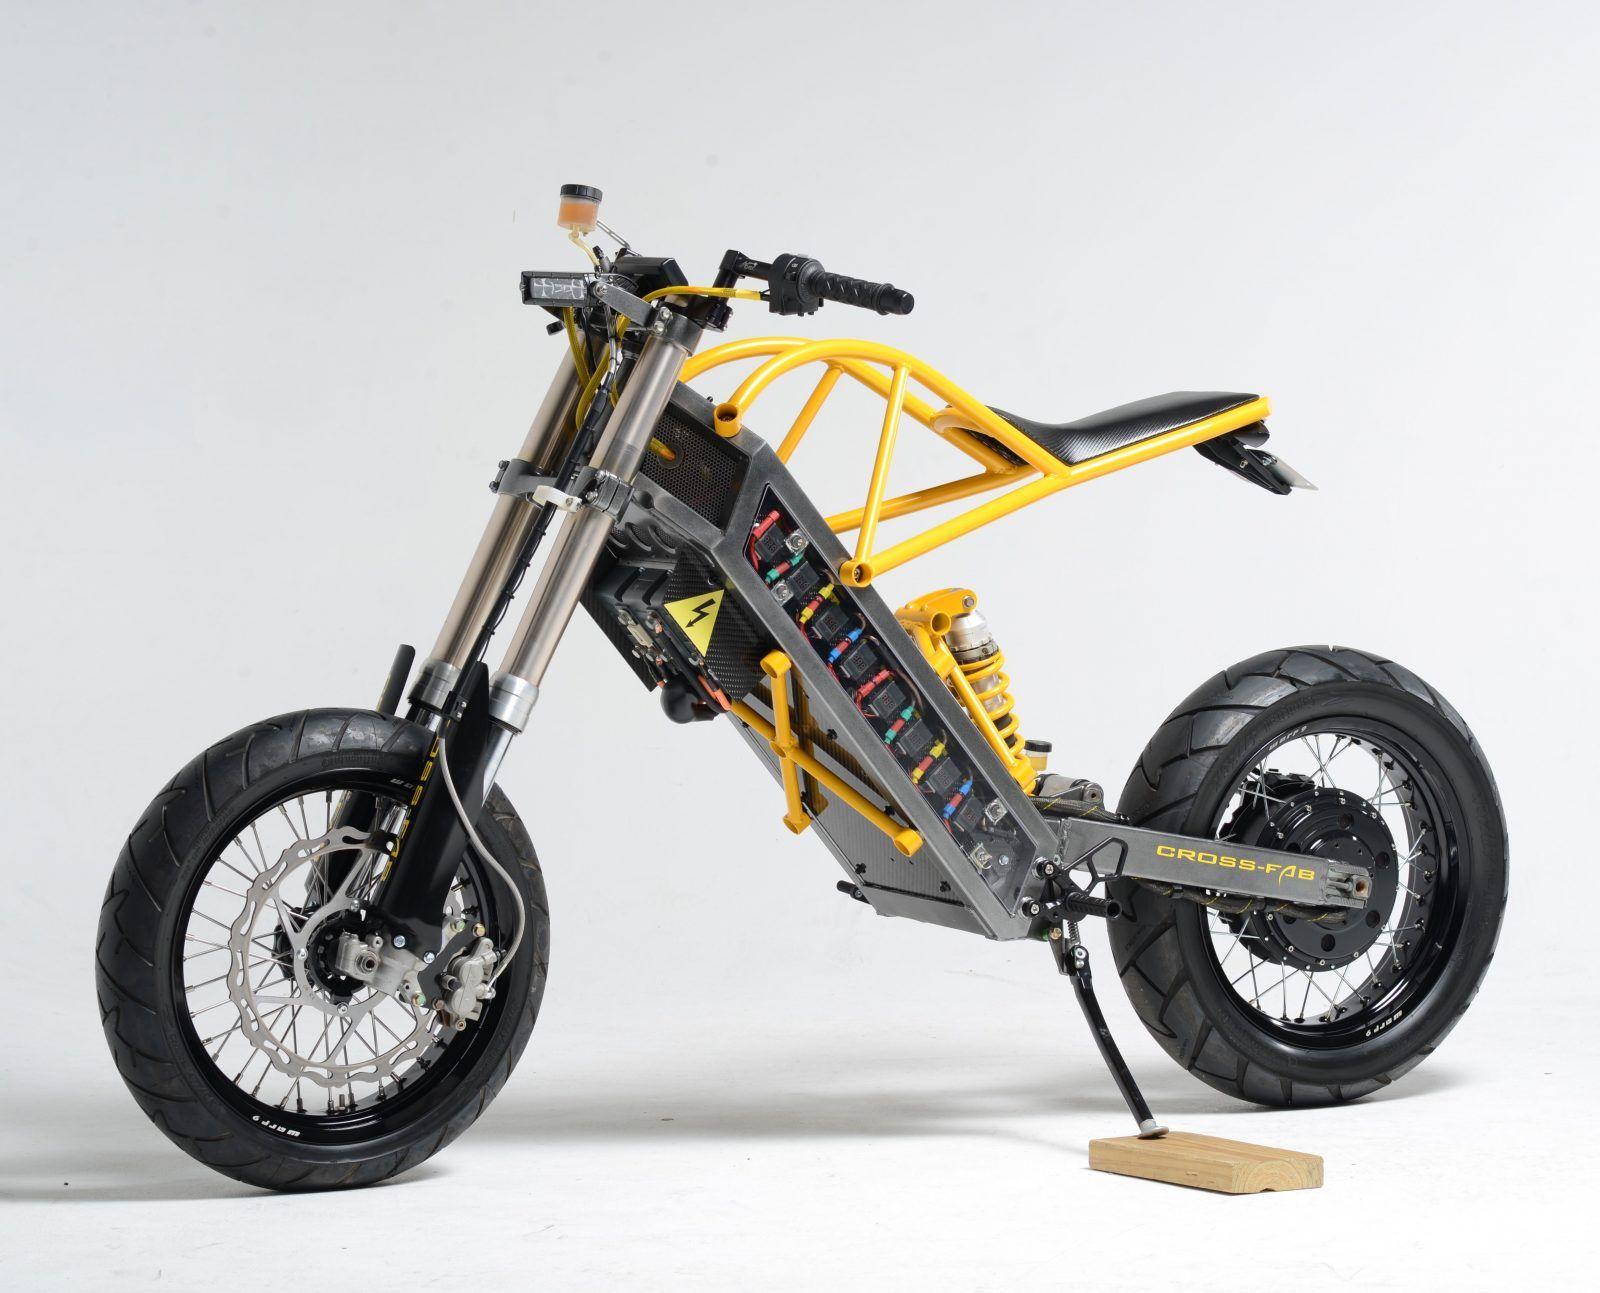 """ExoDyne"" Electric Motorcycle by Alan Cross | 48 LiPo batteries | EnerTrac 11kW rear hub motor | One-off aluminium frame & steel subframe | MX motorcycles swing arm & fork | via Silodrome.com"